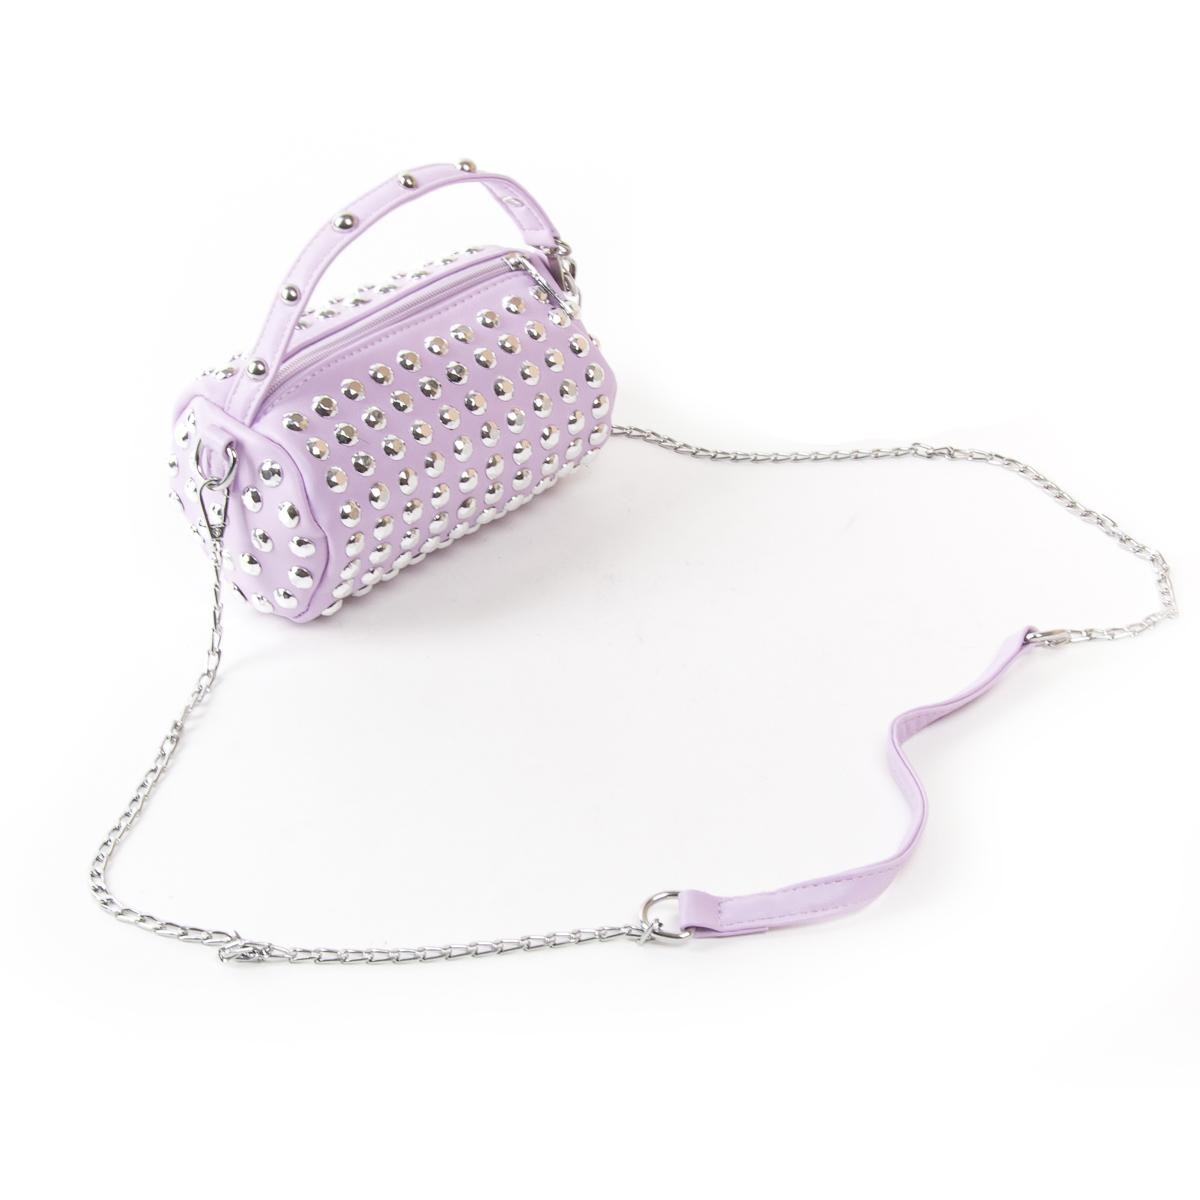 Сумка Женская Клатч иск-кожа FASHION 01-00 6853 purple - фото 4